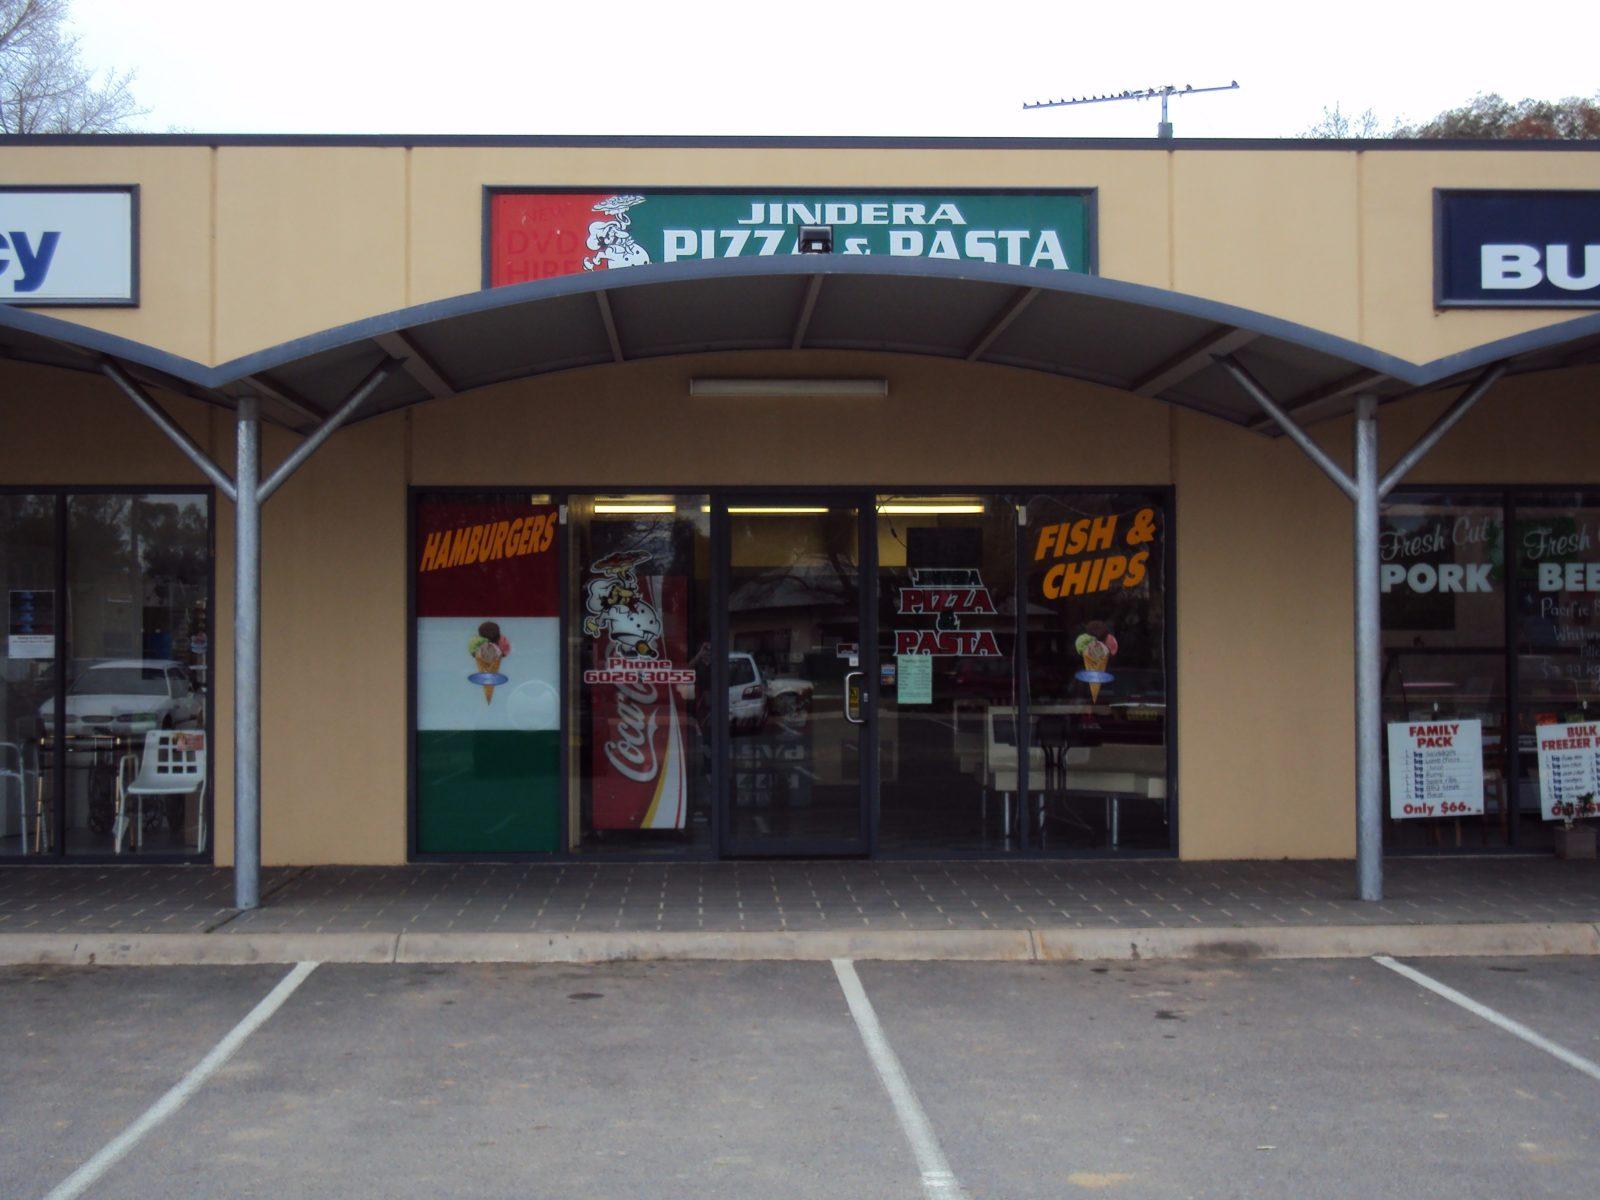 Jindera Pizza, Pasta and Takeaway